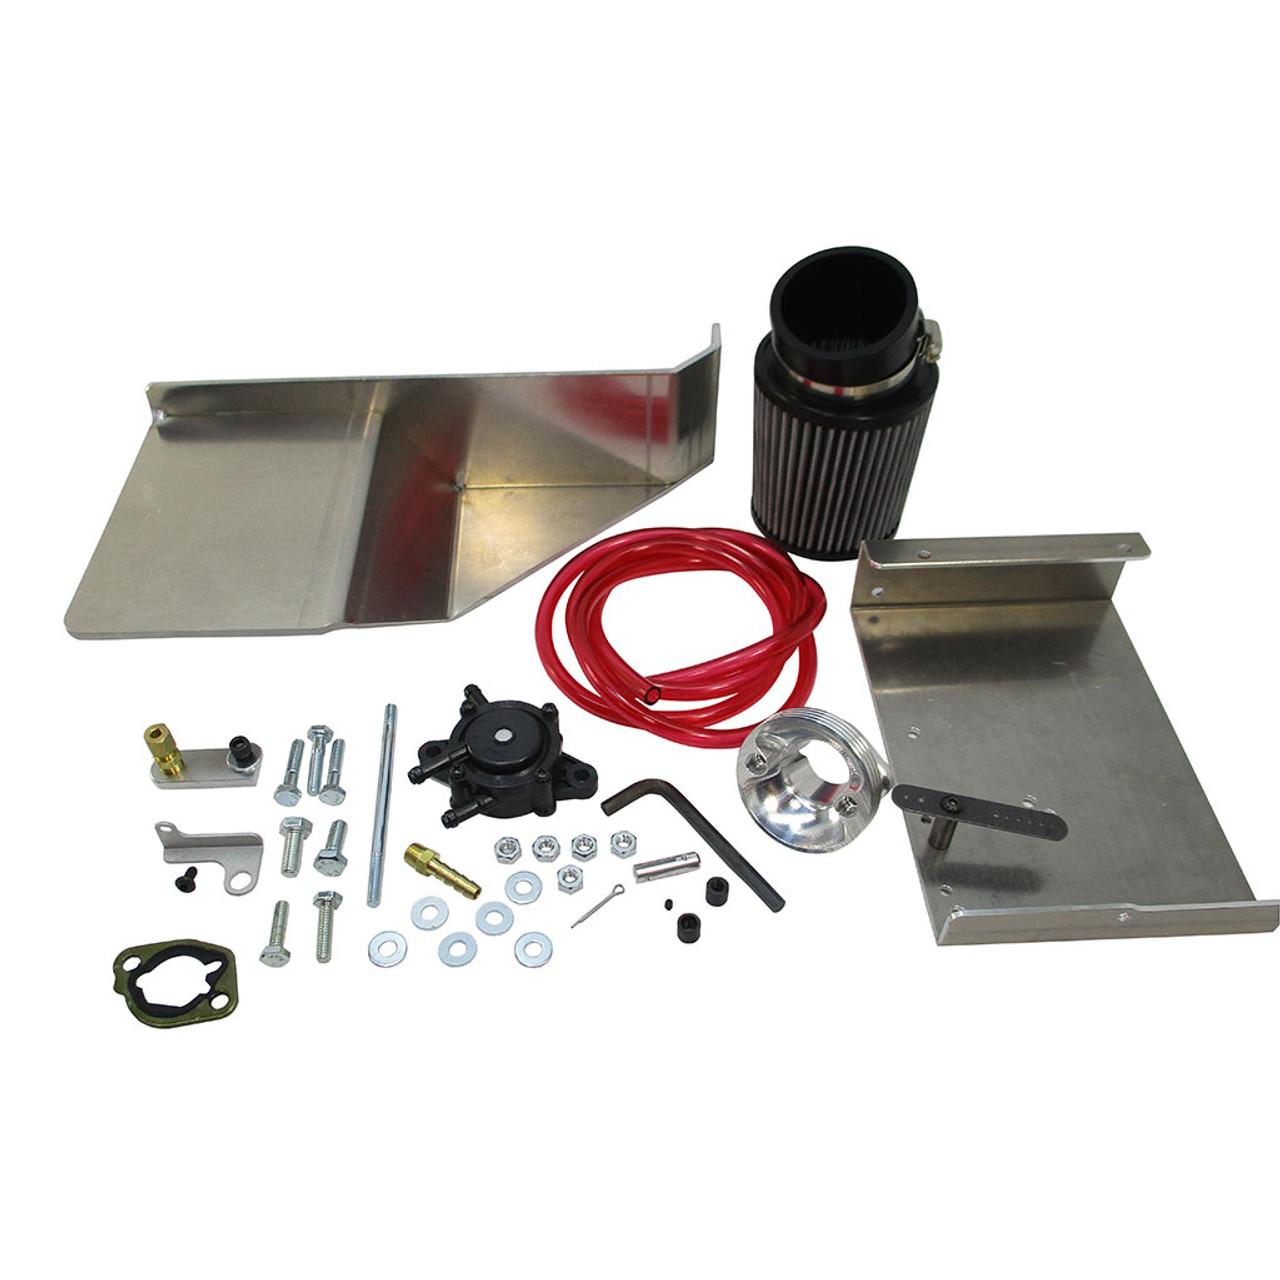 Predator 212cc NON-Hemi Box Stock Parts Kit Filter Fuel Pump Top Plate